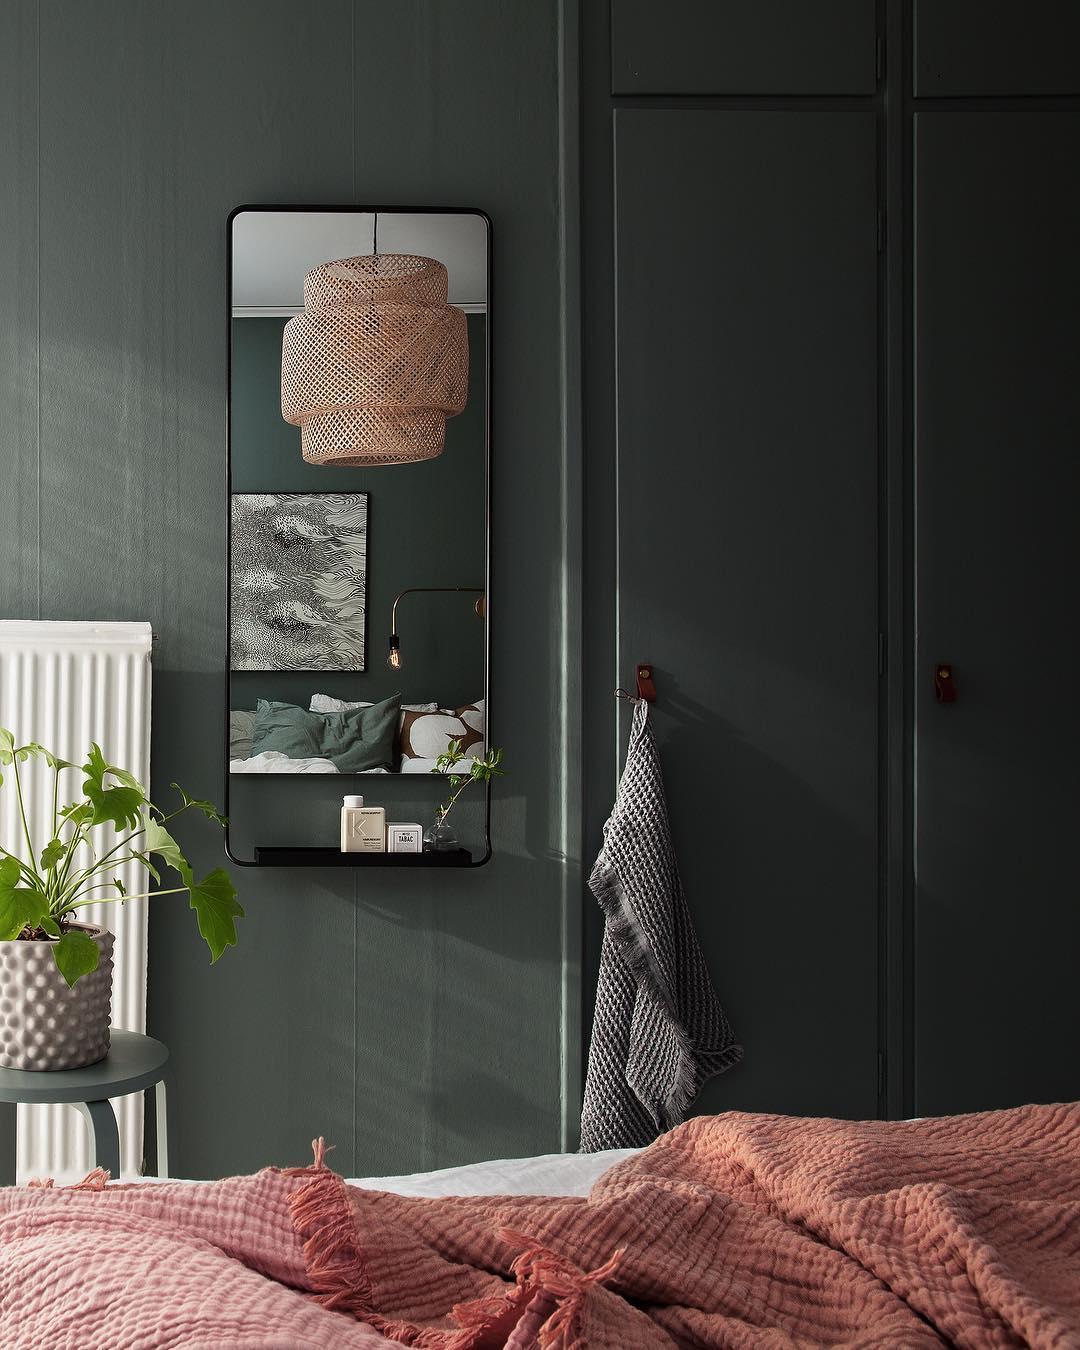 13x Groene muur in de slaapkamer